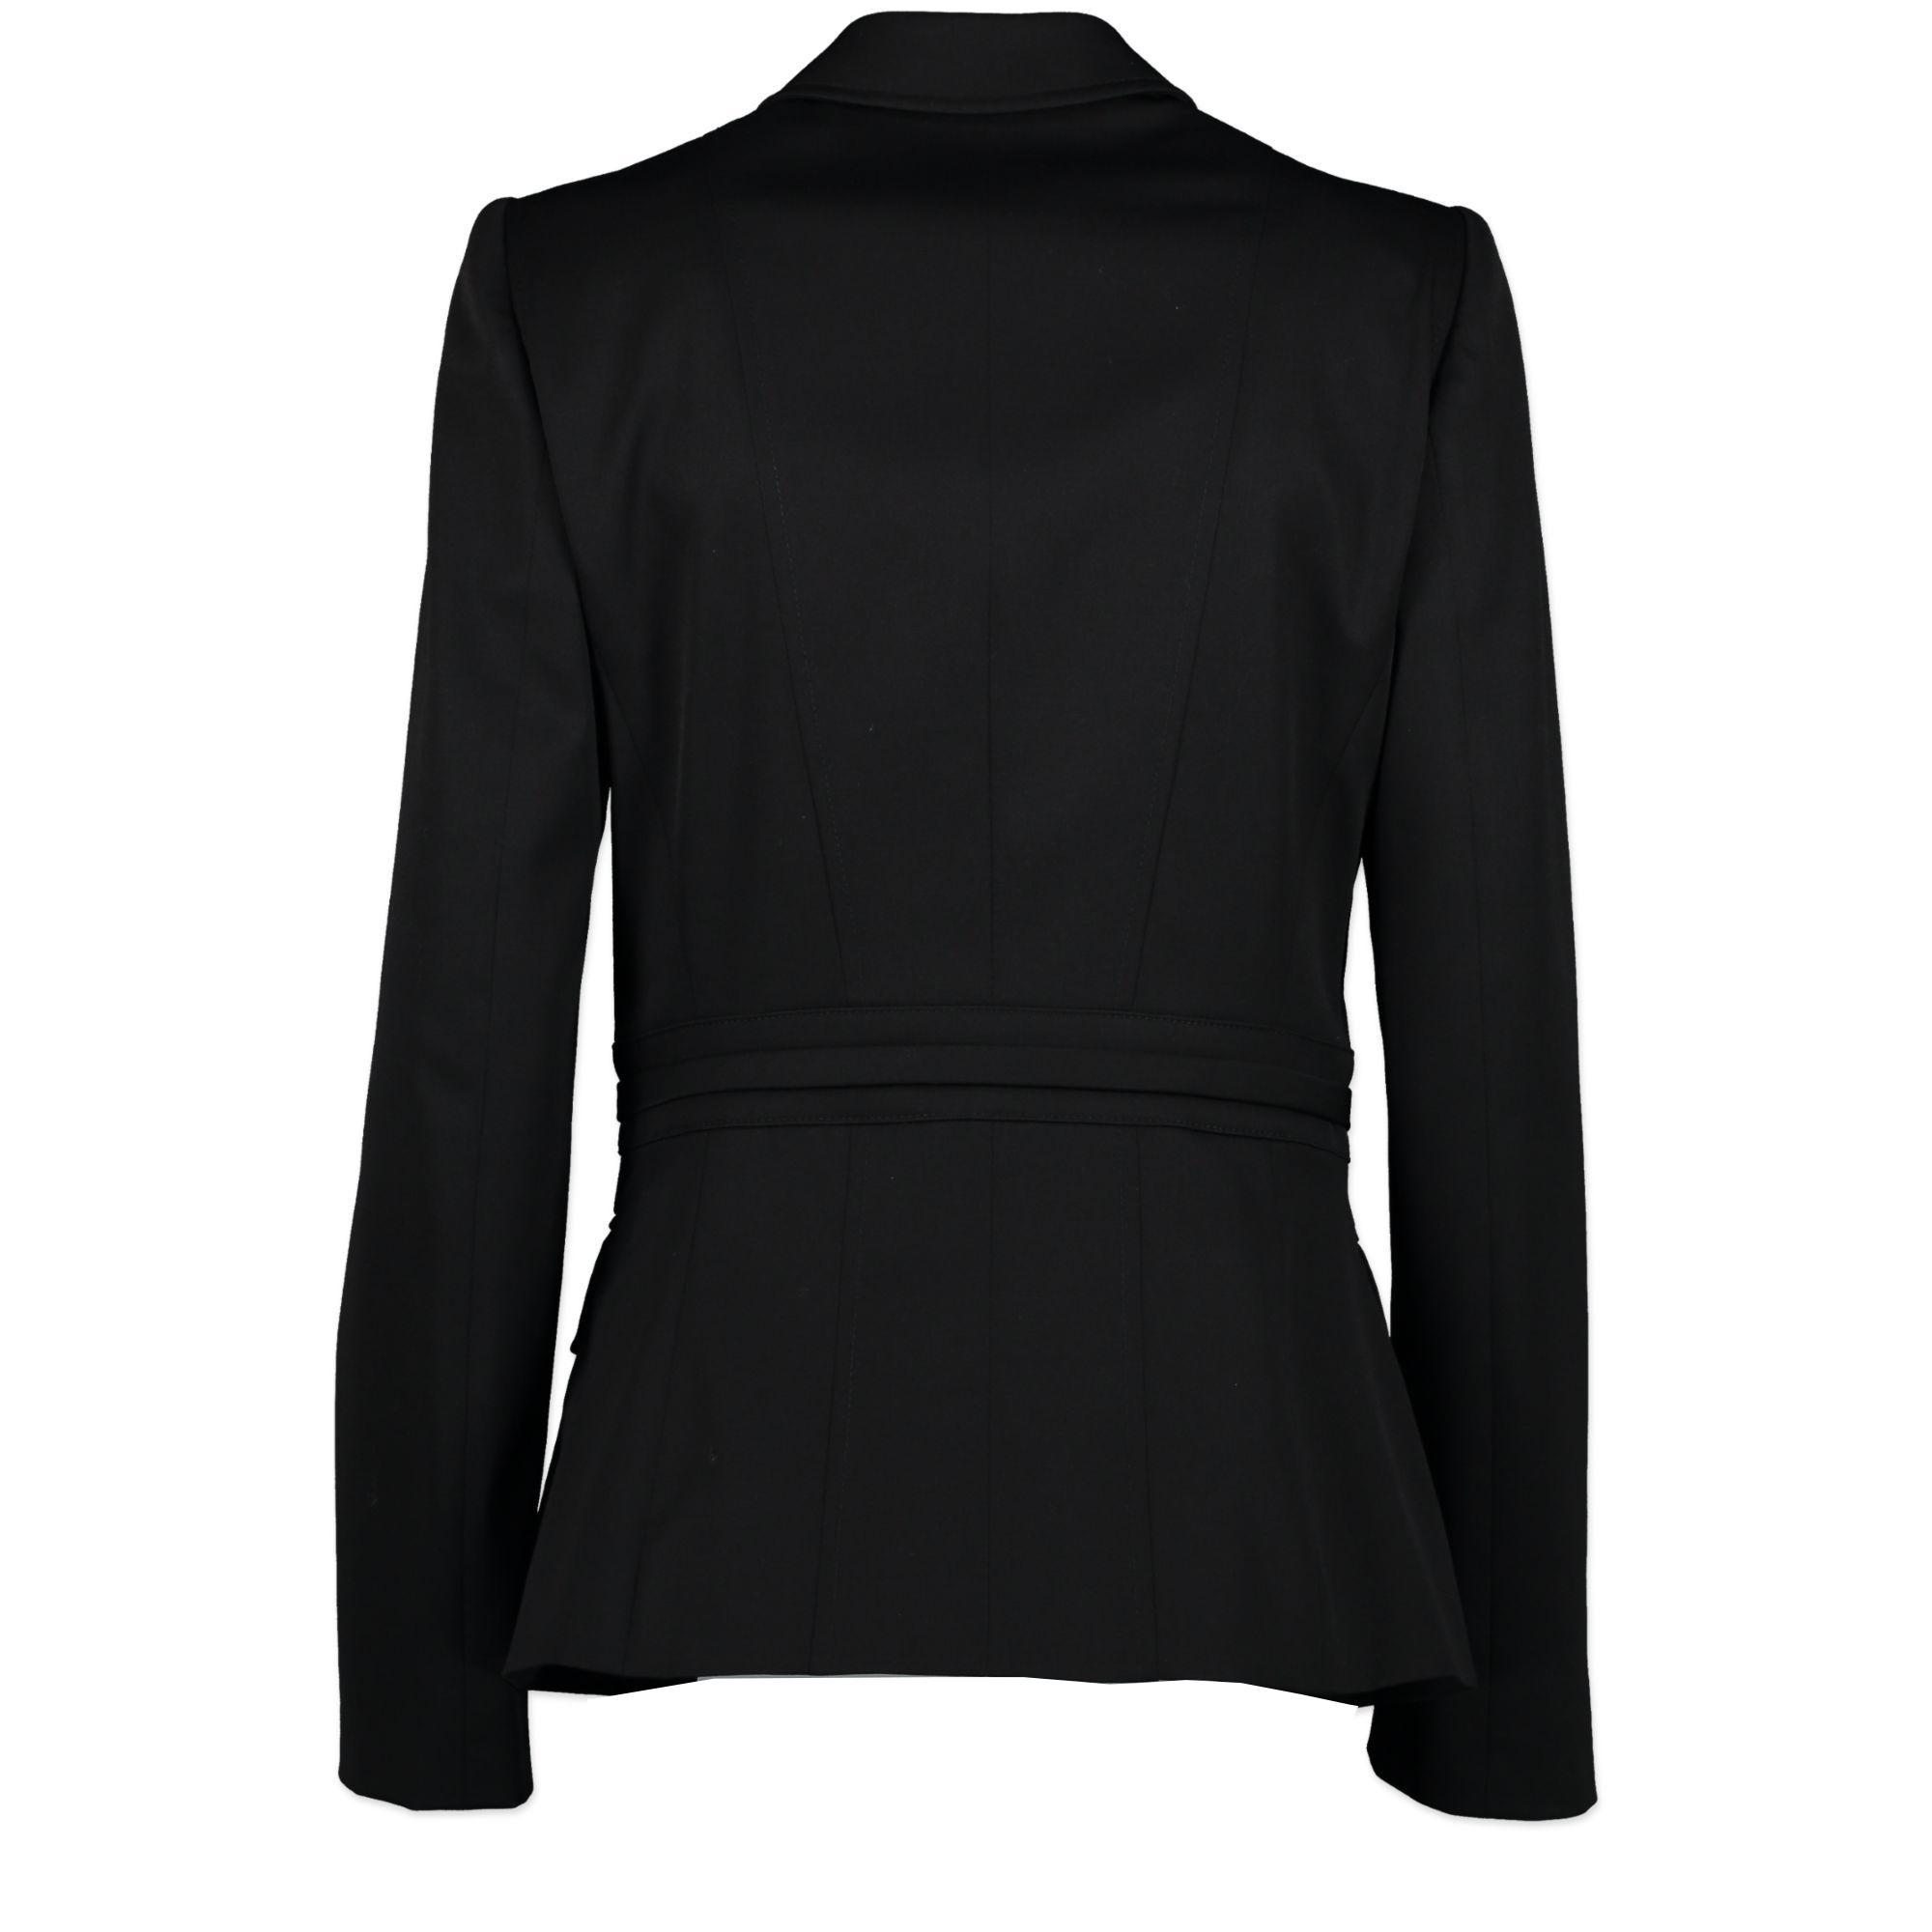 Gucci Black Blazer - Size: 40